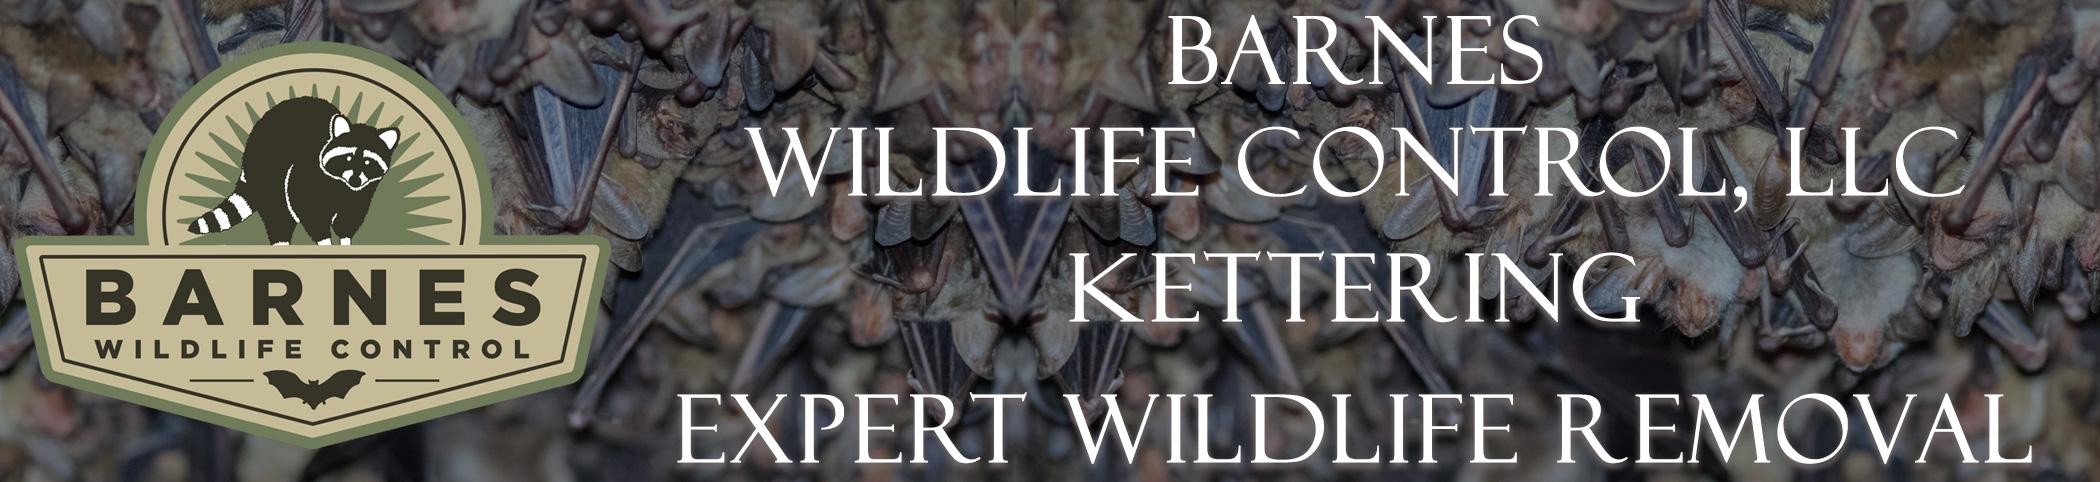 barnes_wildlife_Kettering_ohio_headers